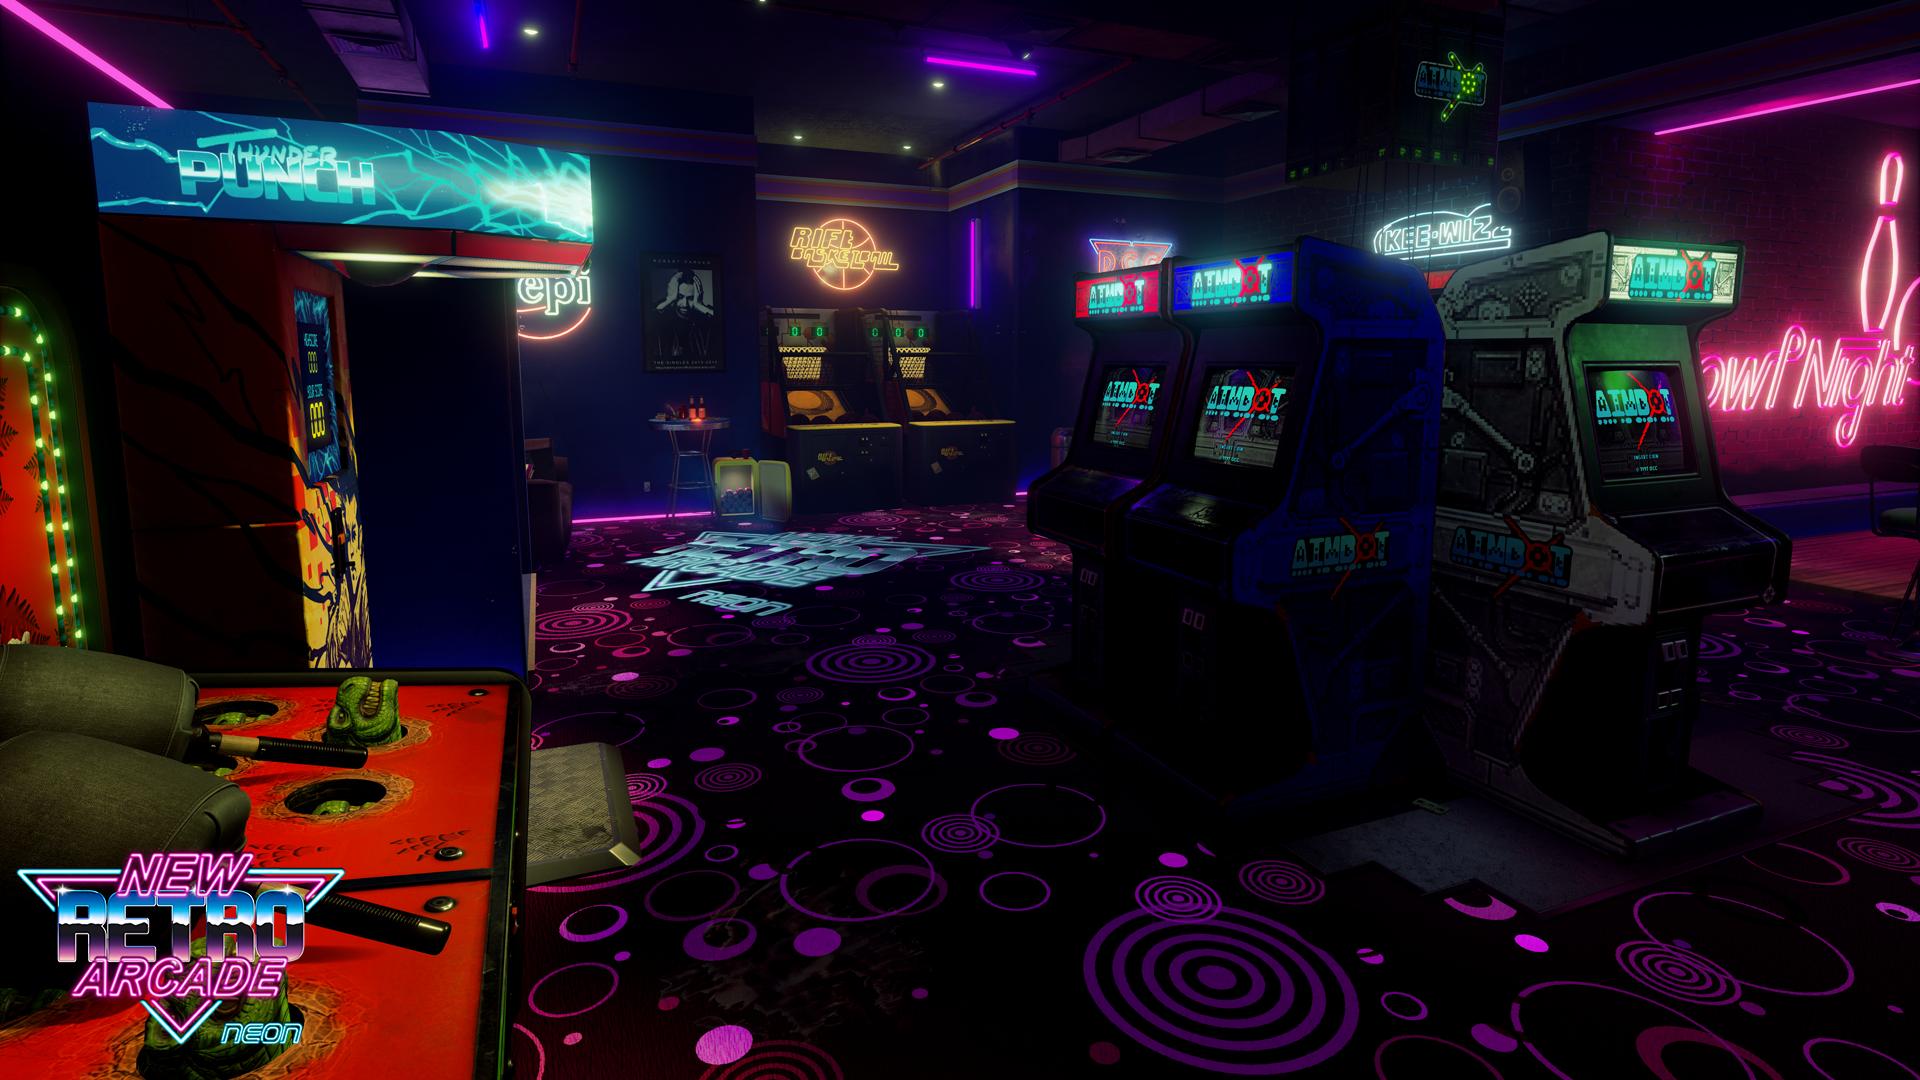 new retro arcade neon digital cybercherries mobile game home screen game of thrones home screen